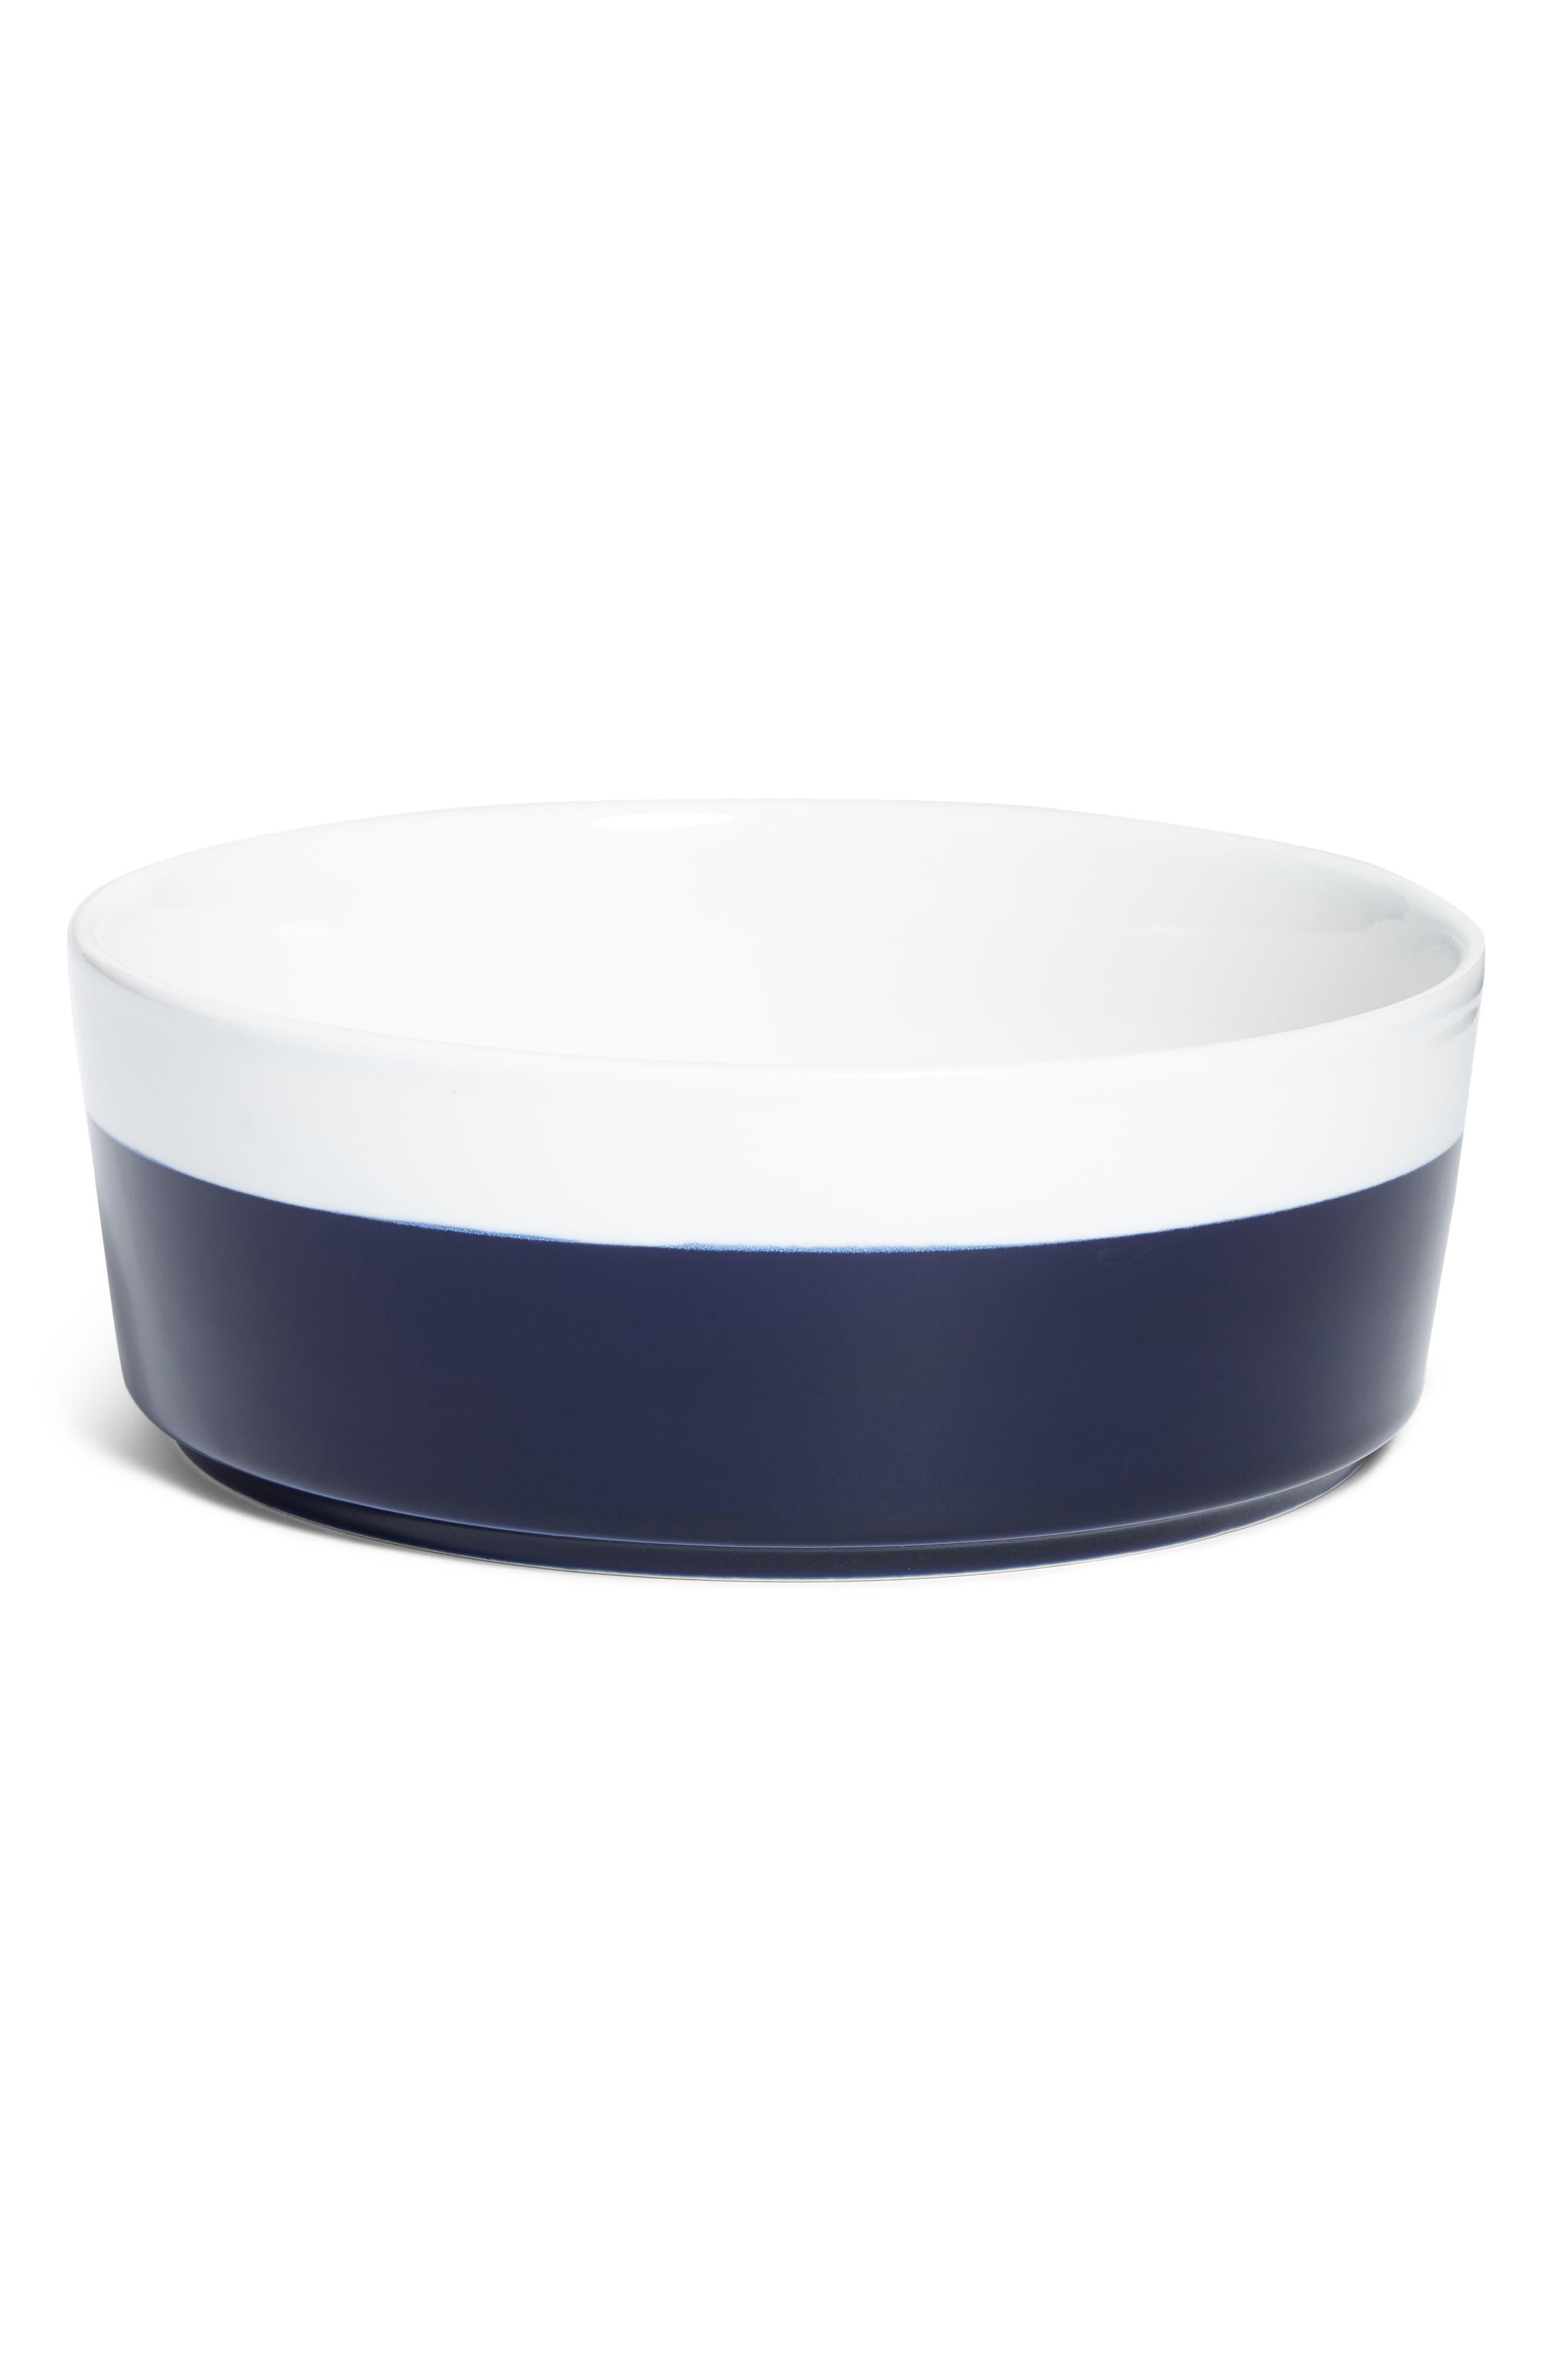 Dipper Ceramic Dog Bowl,                         Main,                         color, Midnight L